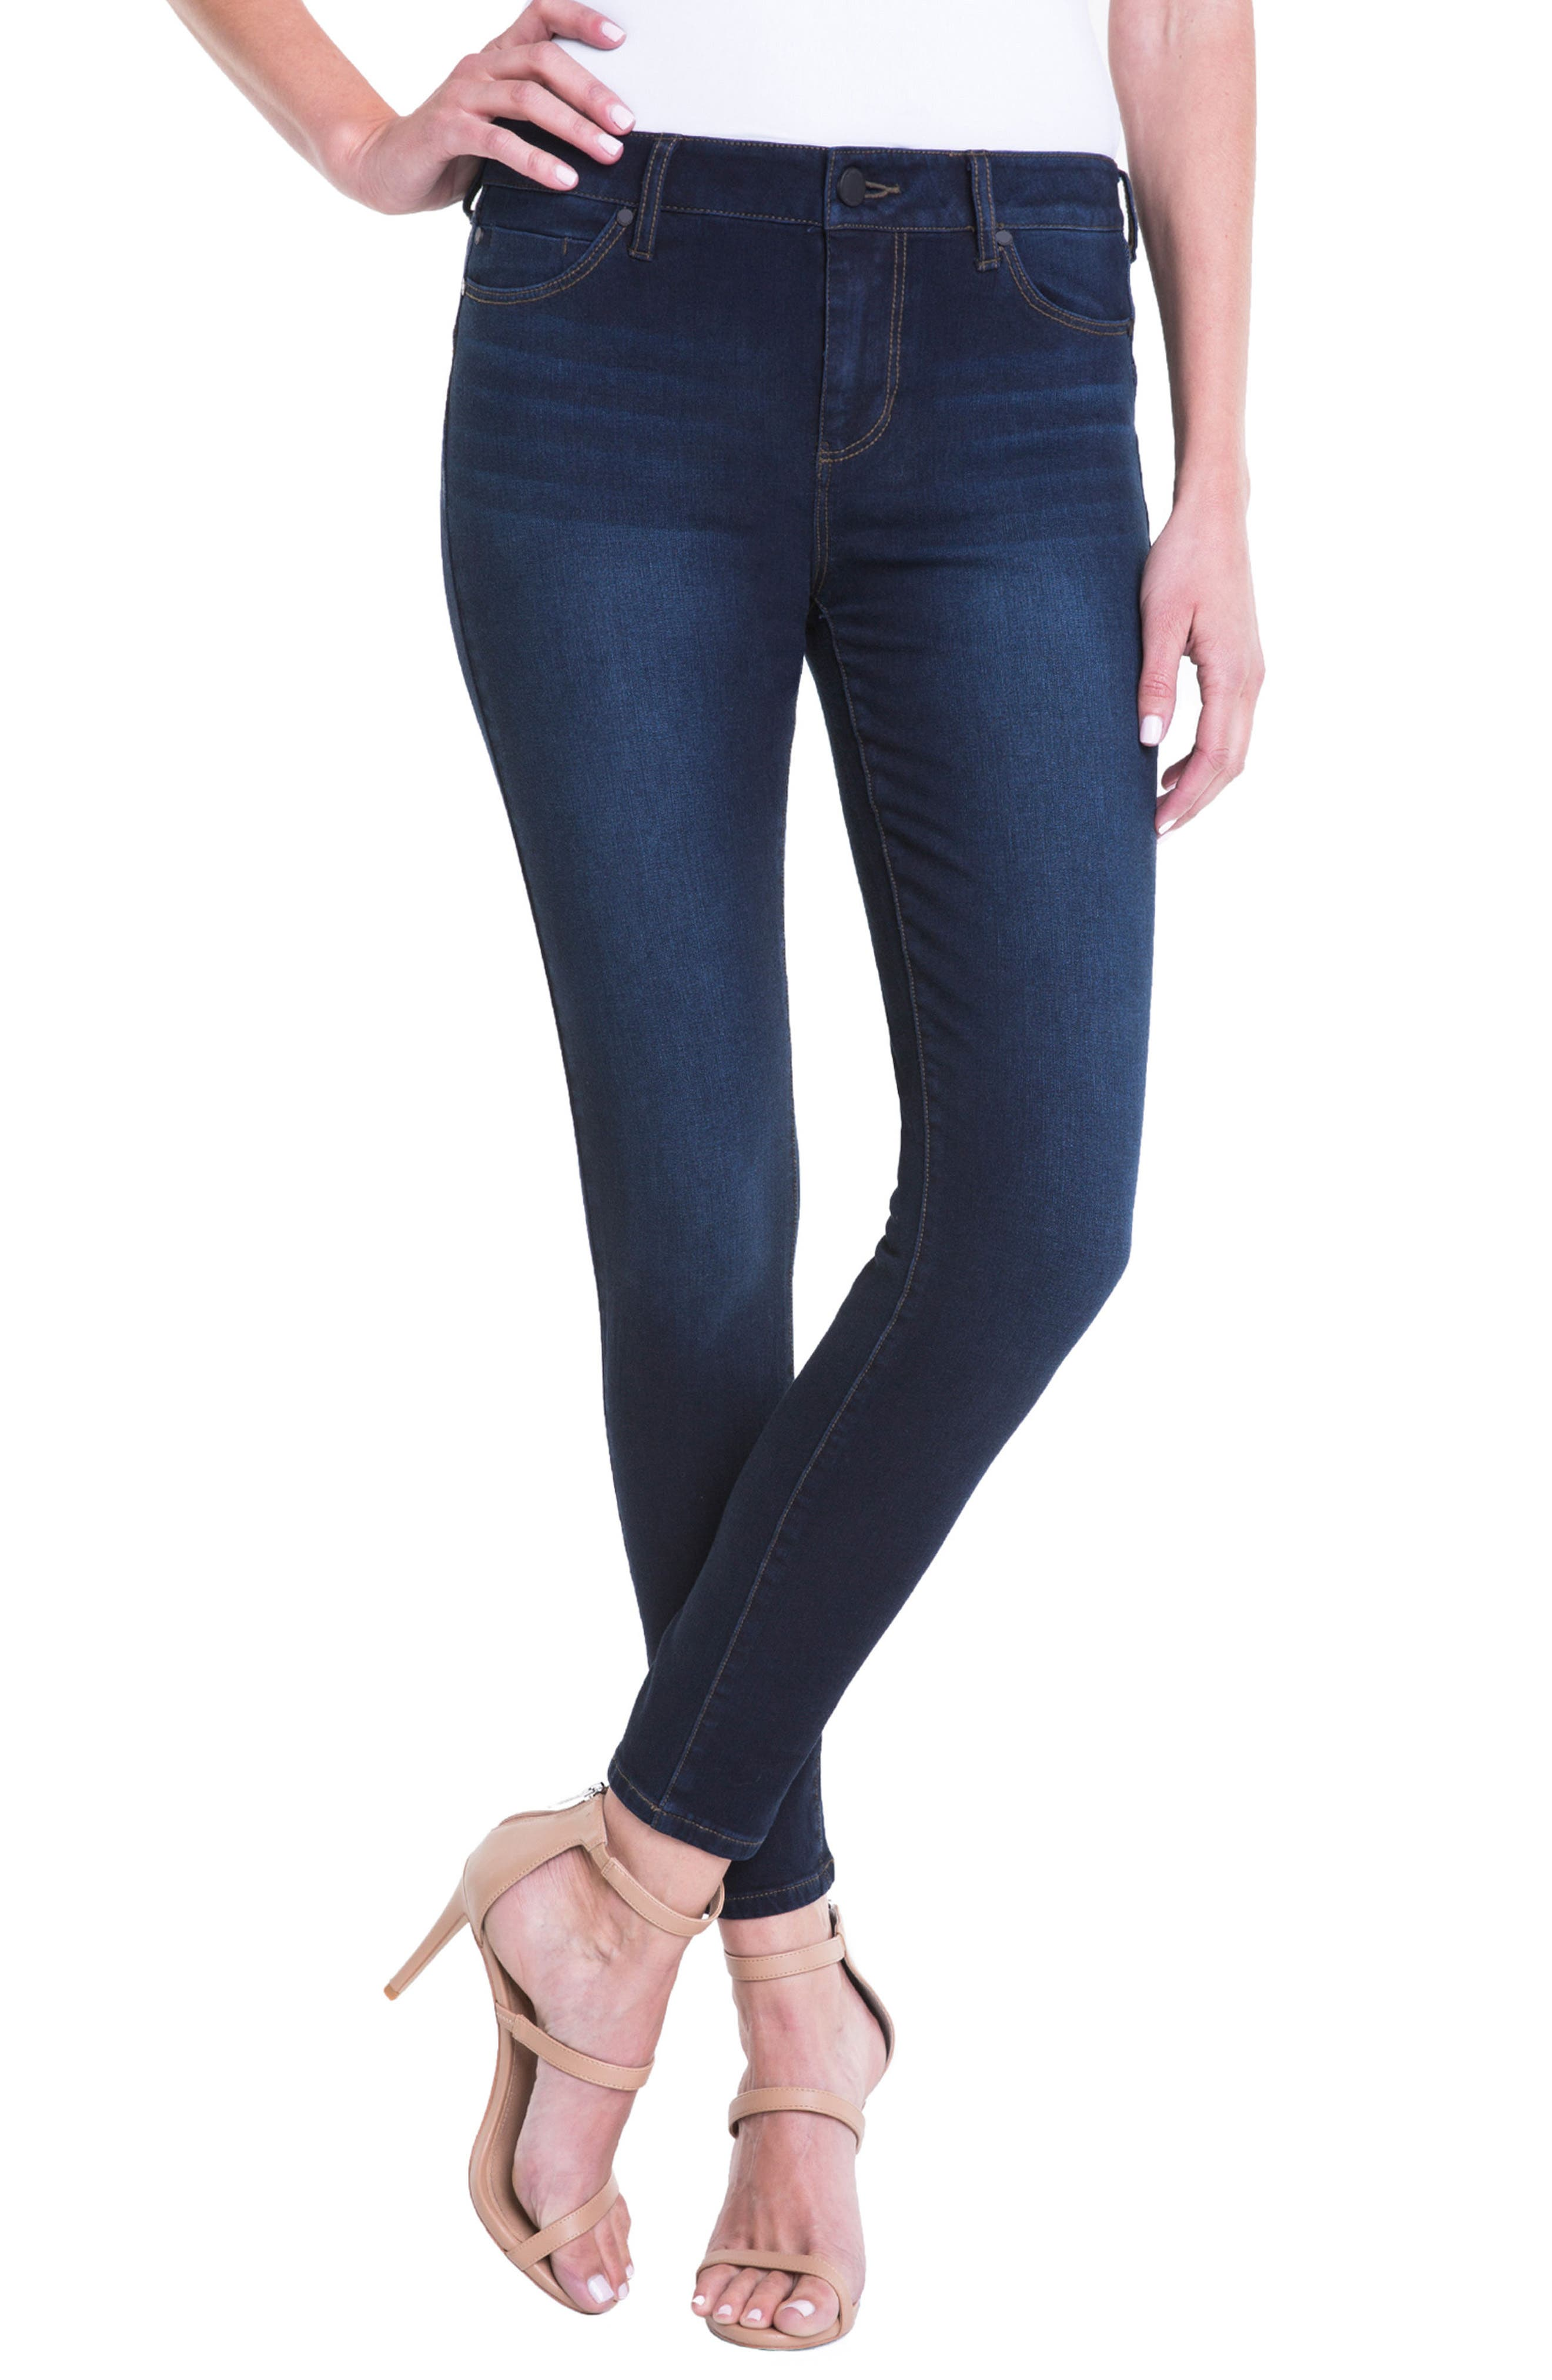 Jeans Company Piper Hugger Lift Sculpt Ankle Skinny Jeans,                         Main,                         color, BLACKOUT BLUE